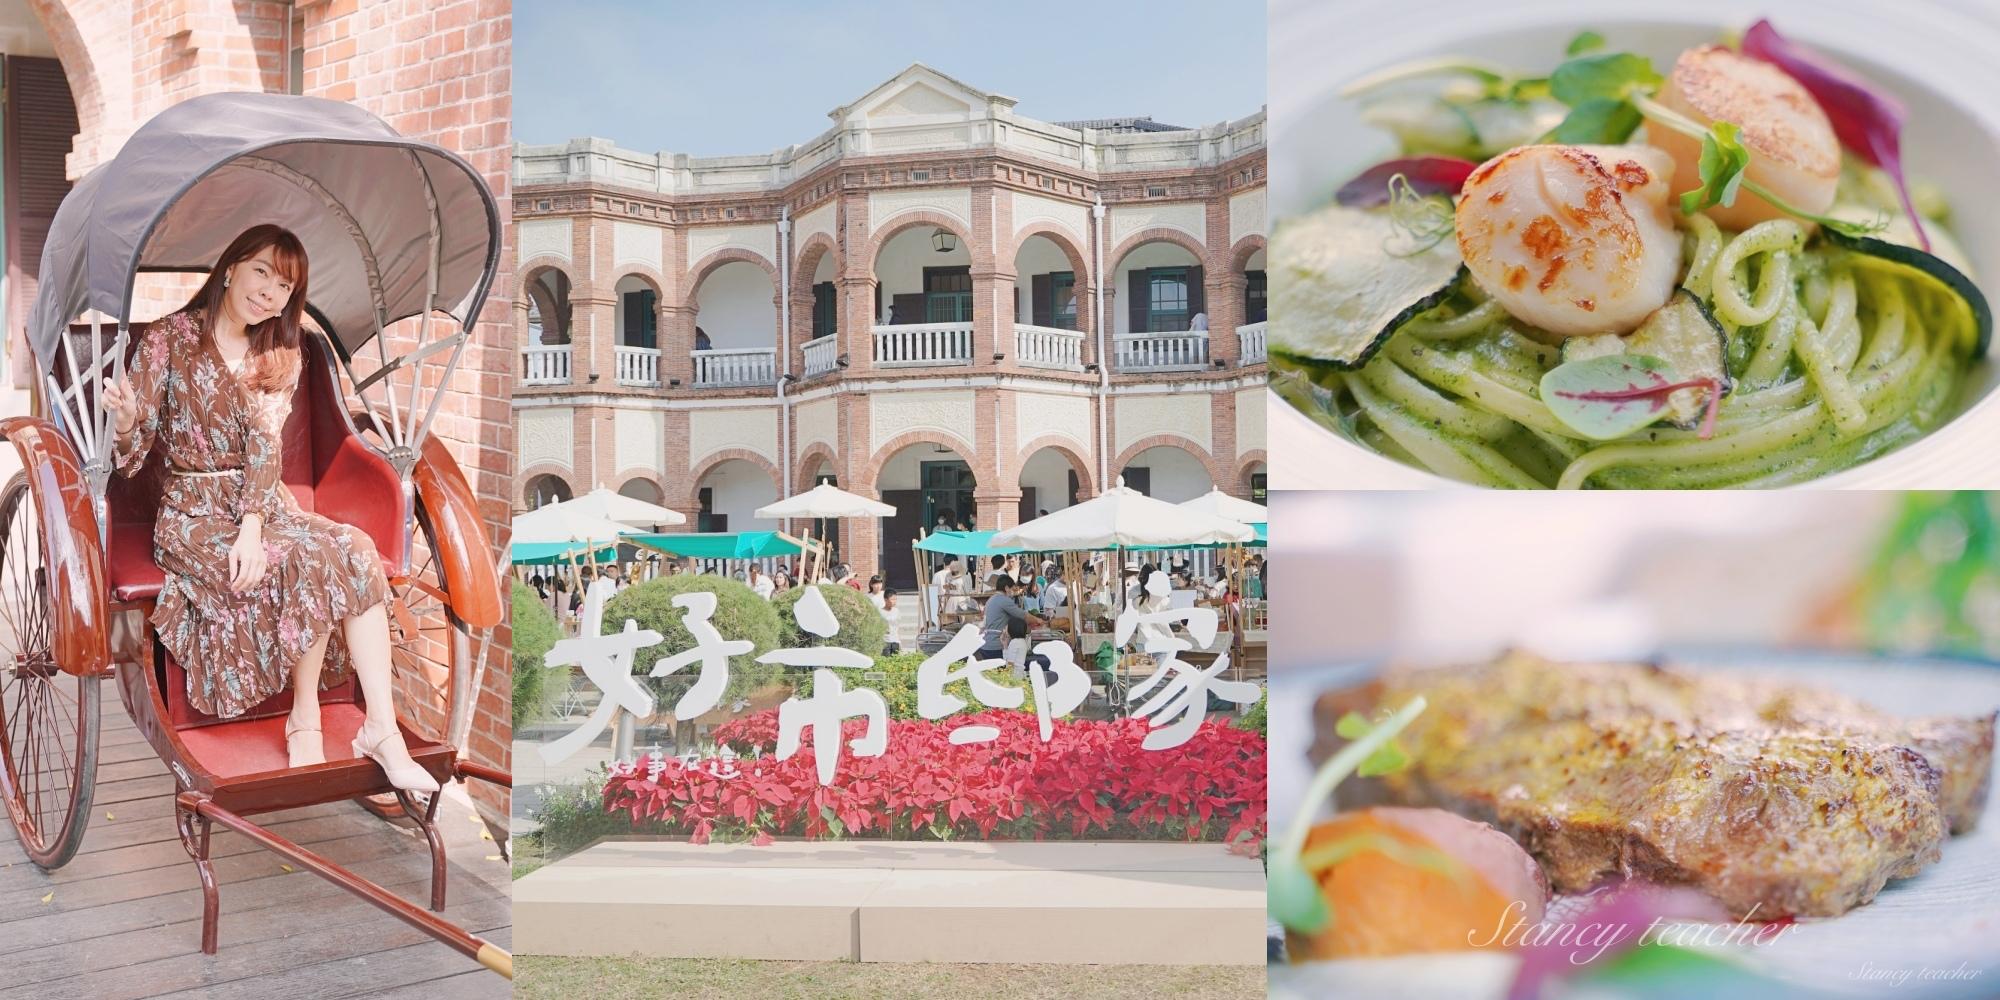 uMeal Bistro台南店知事官邸|百年古蹟餐酒館|台南低醣餐廳|台南優膳糧(菜單、價格)